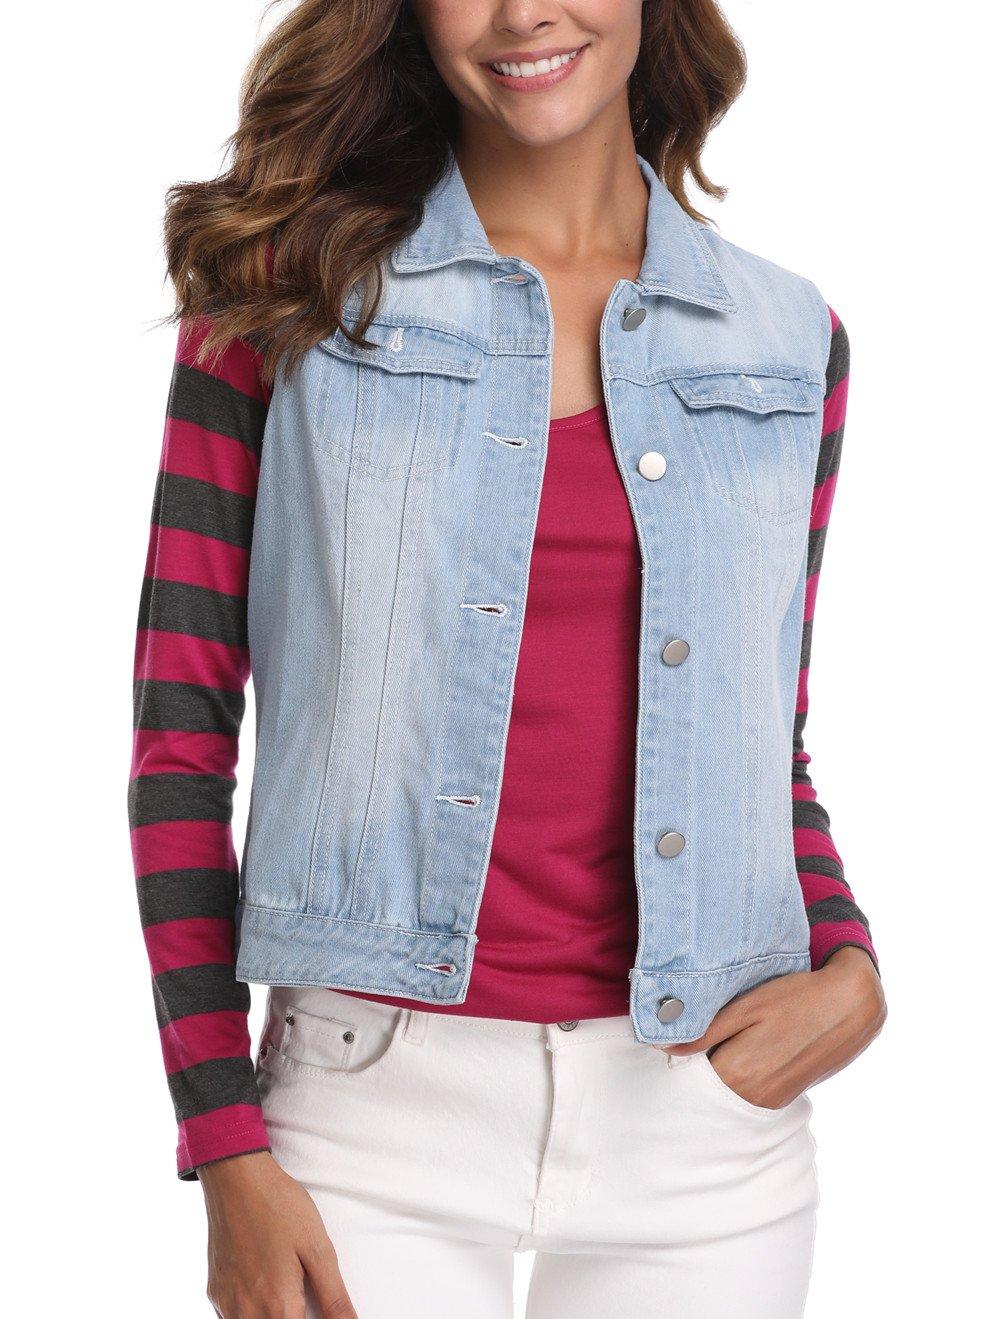 MISS MOLY Women's Sleeveless Light Blue Denim Jeaket Vest Button Up Dowm Denim Vests Coats w 2 Flap Pockets M